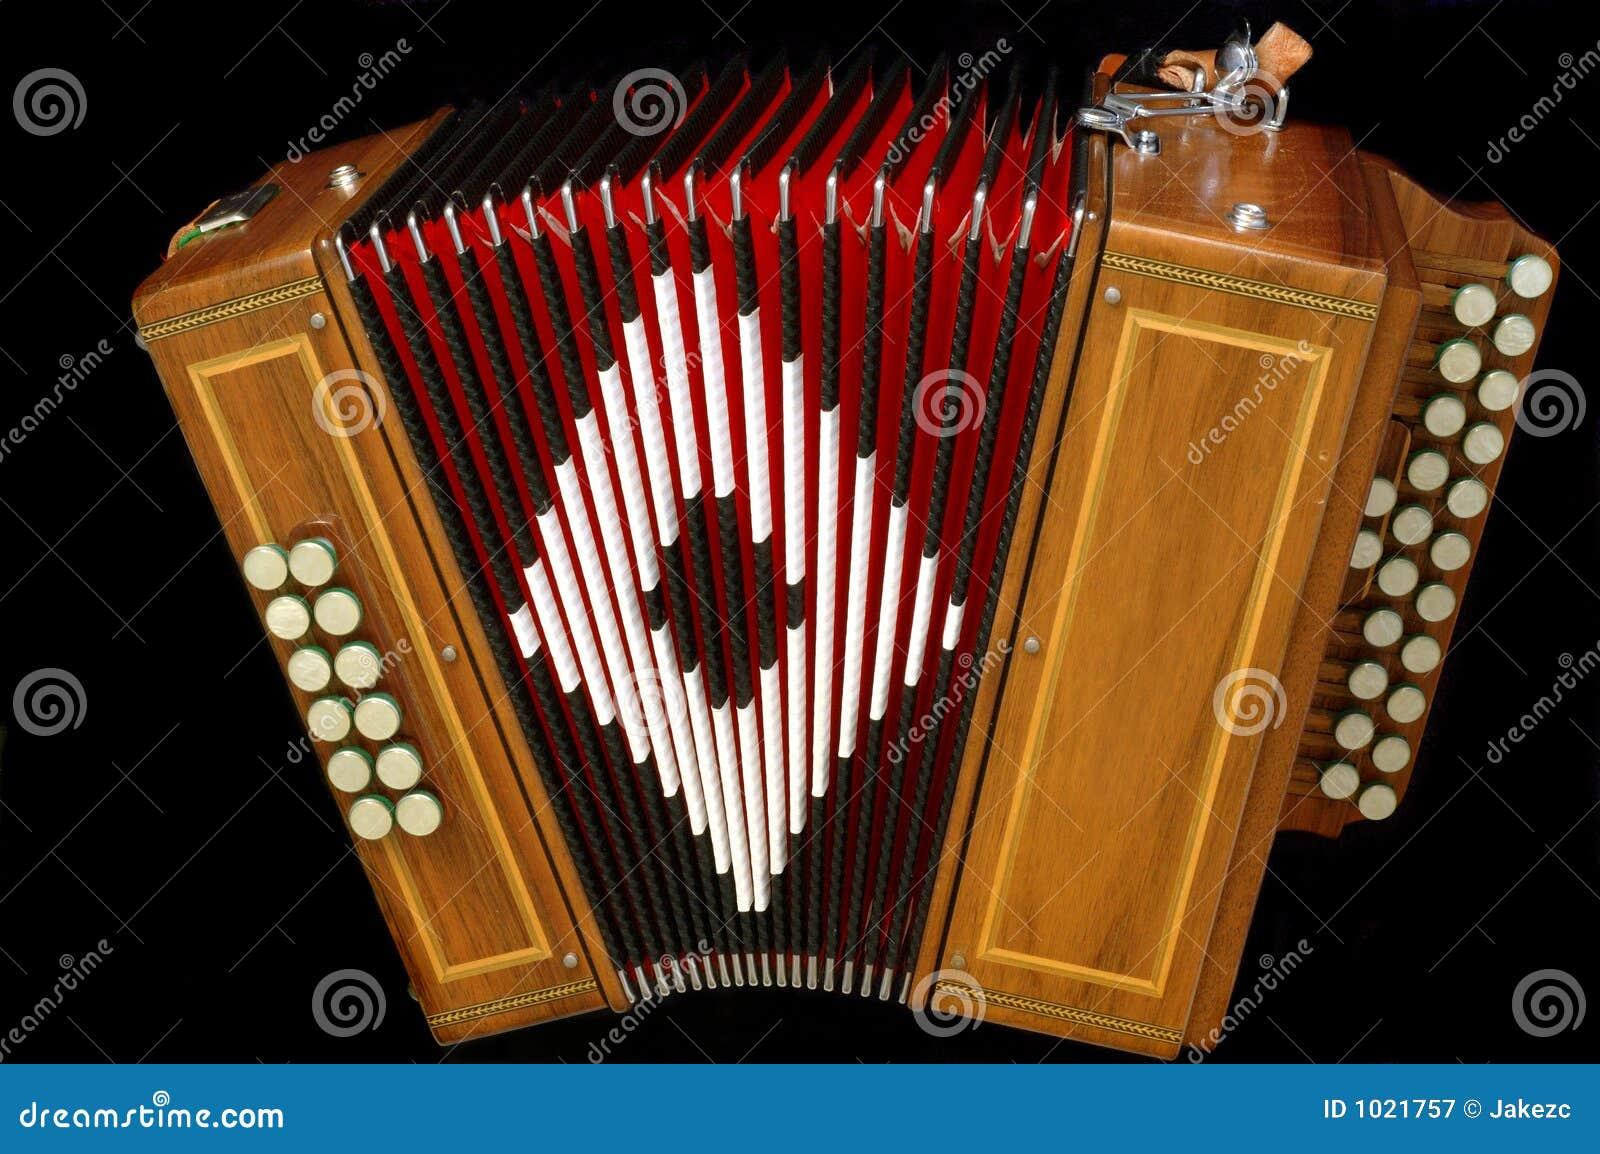 how to play diatonic accordian